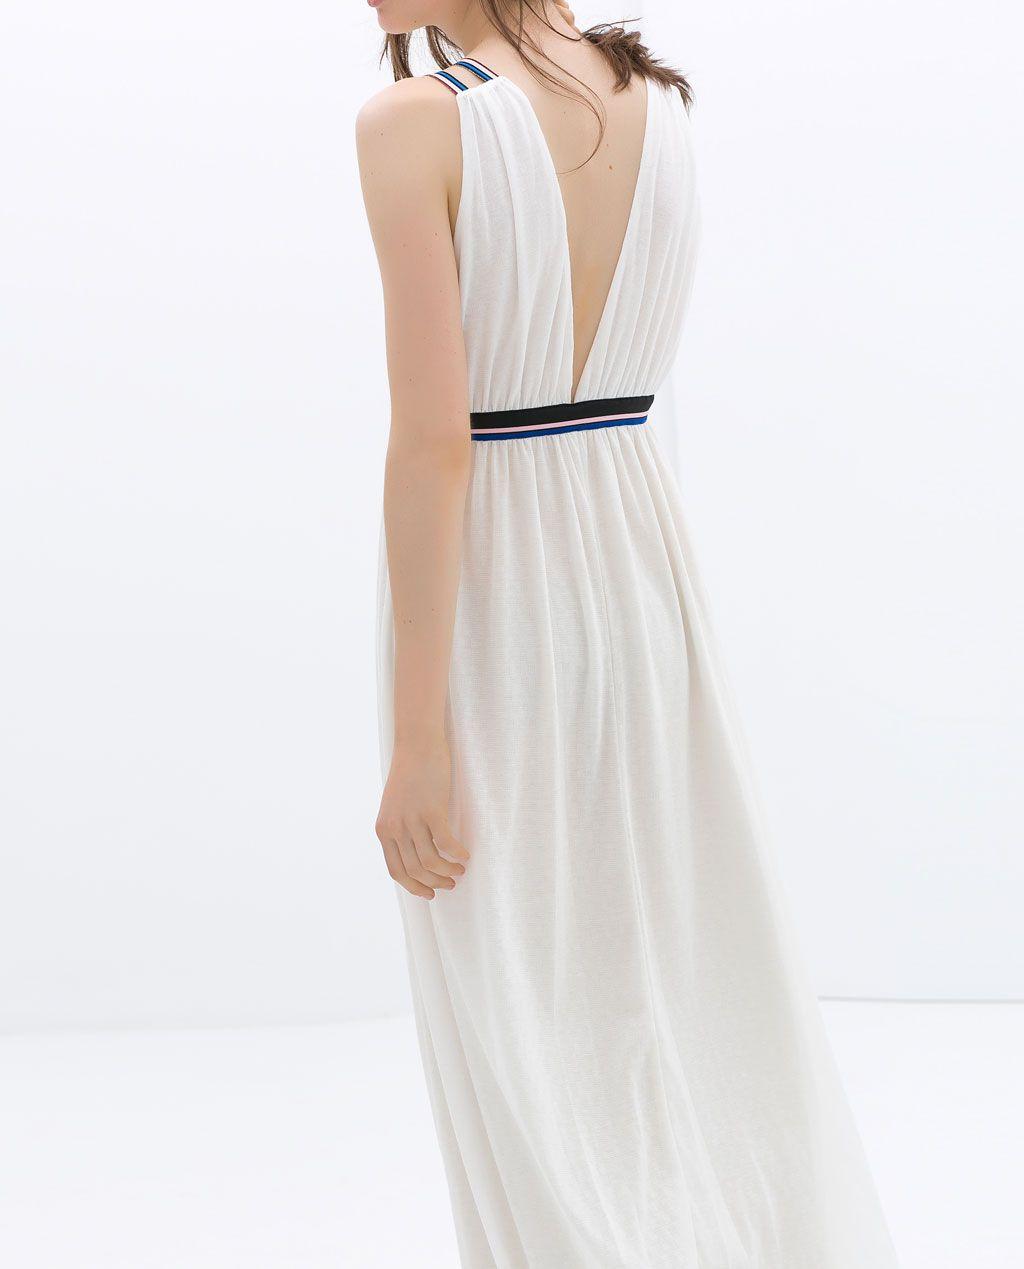 super popular 85704 c75b2 ZARA - NEW THIS WEEK - | WL | Dresses, ZARA e Formal dresses